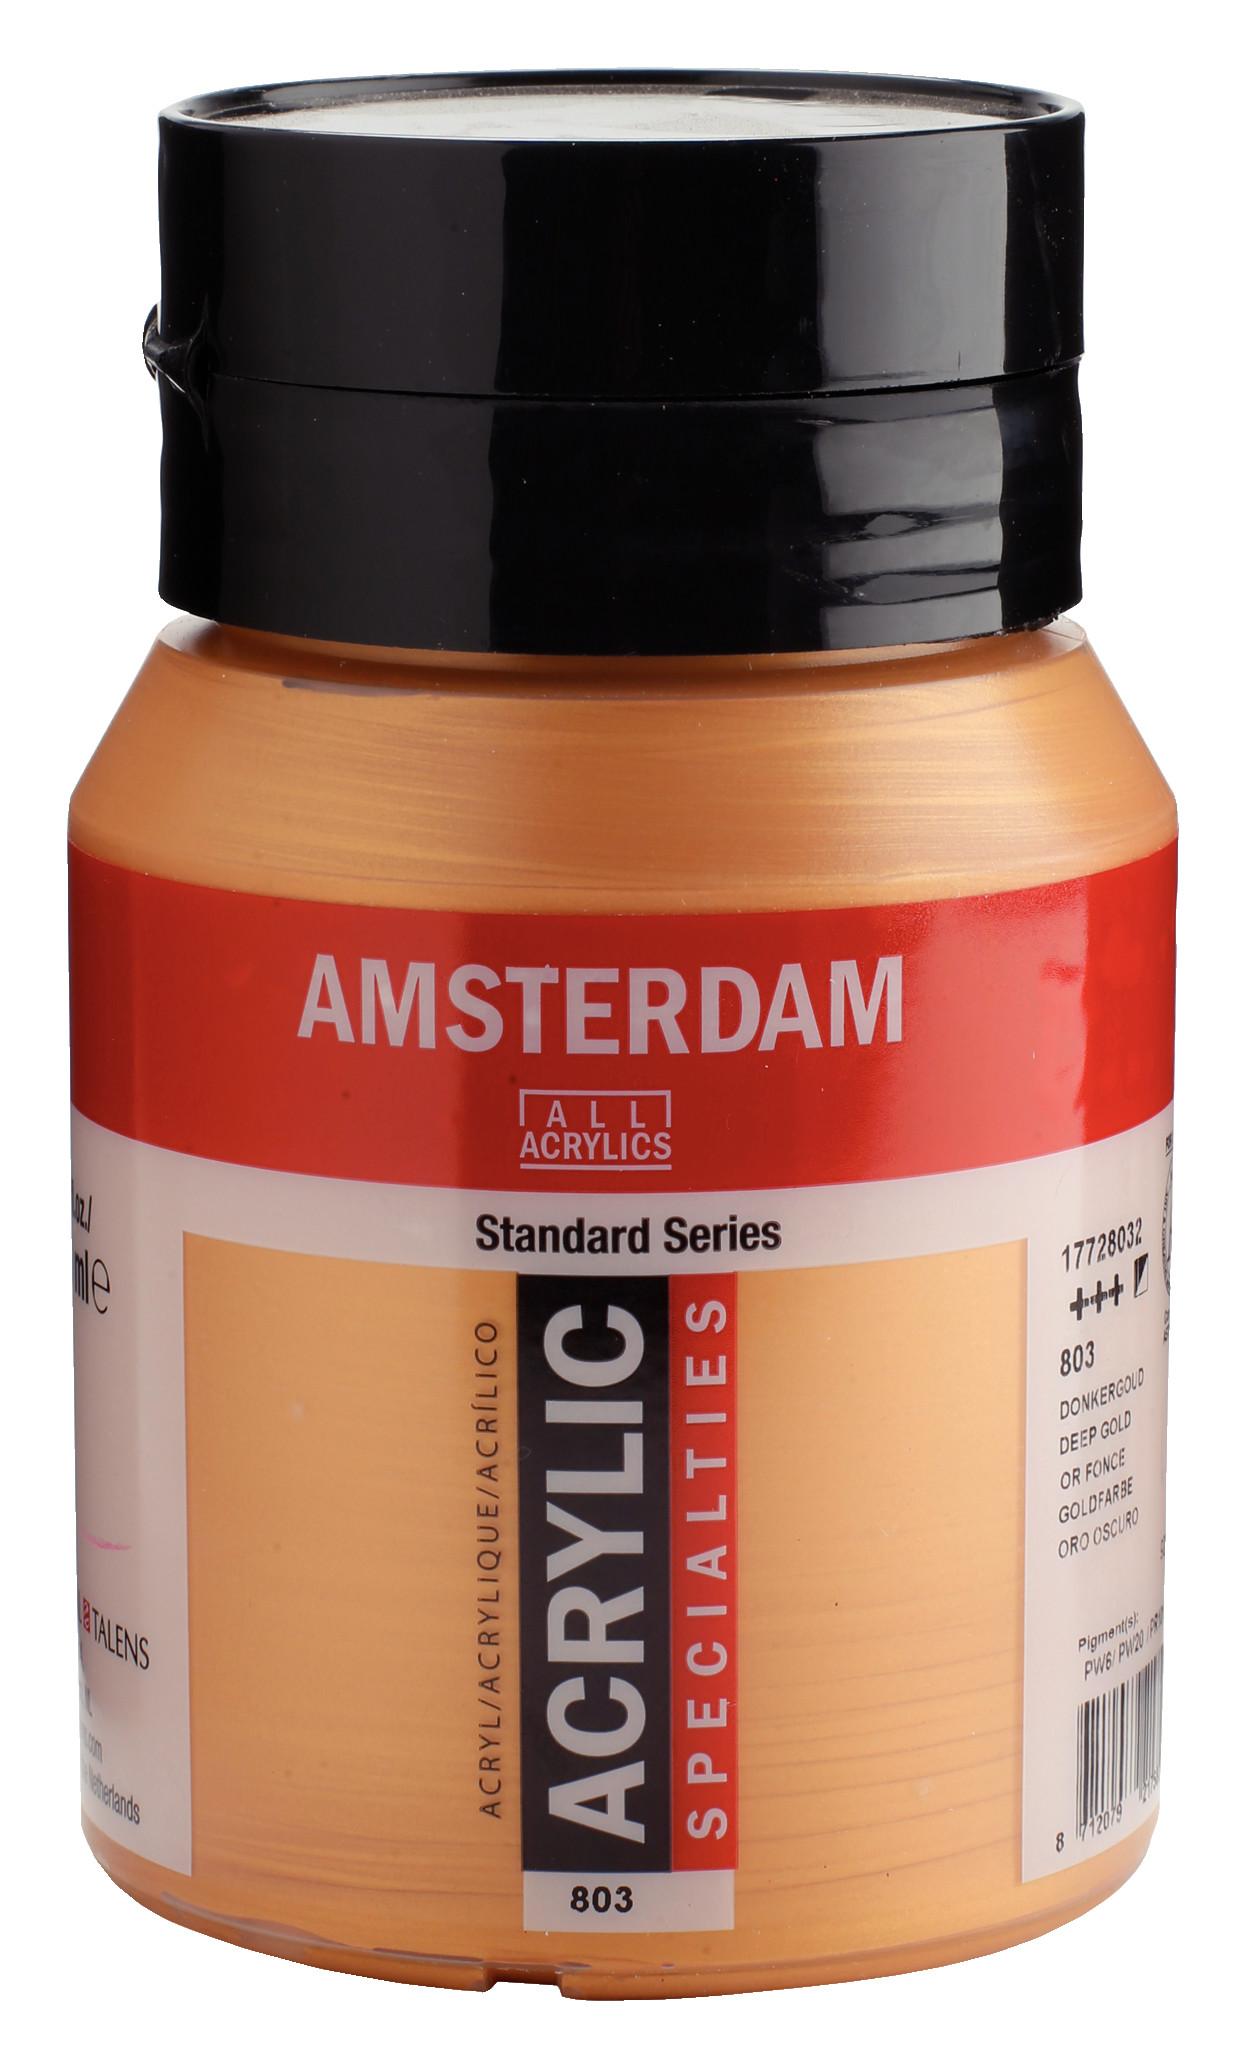 Amsterdam Standard Series Acrylic Jar 500 ml Deep Gold 803